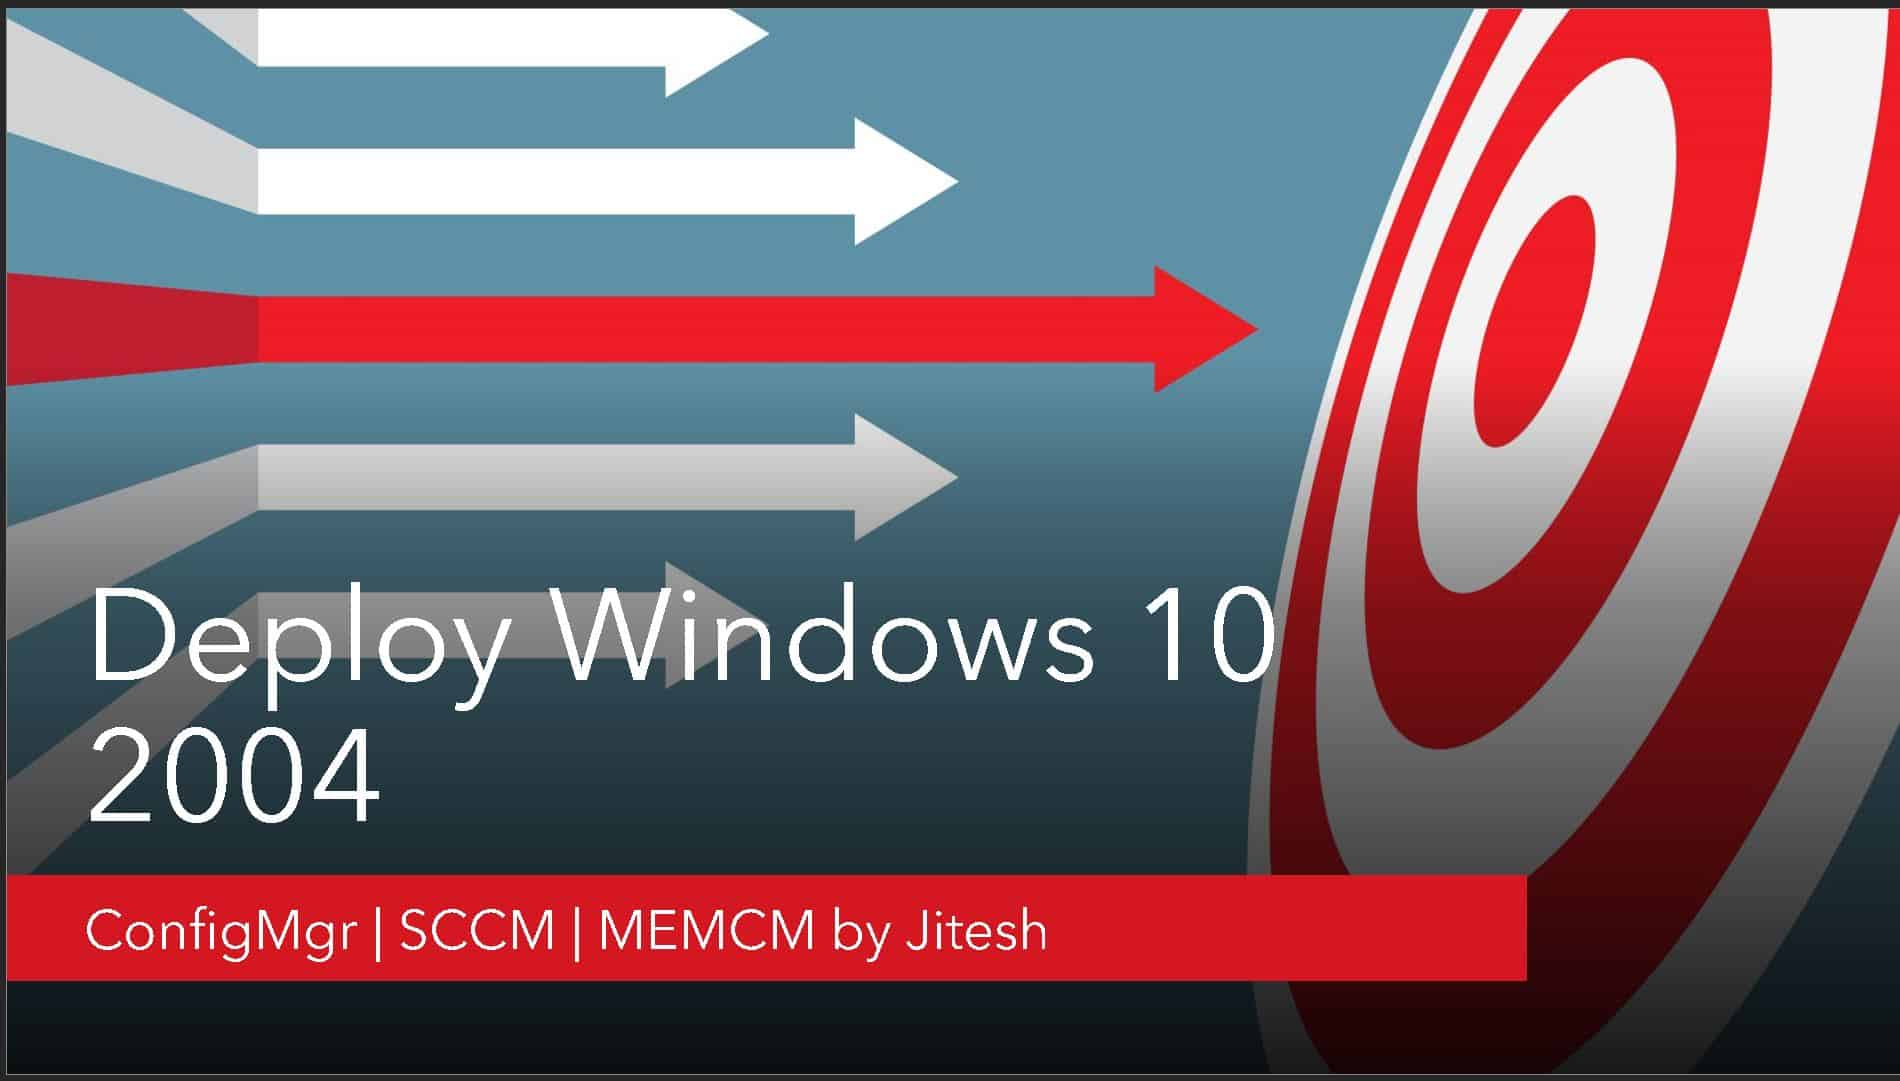 Deploy Windows 10 2004 Using SCCM ConfigMgr